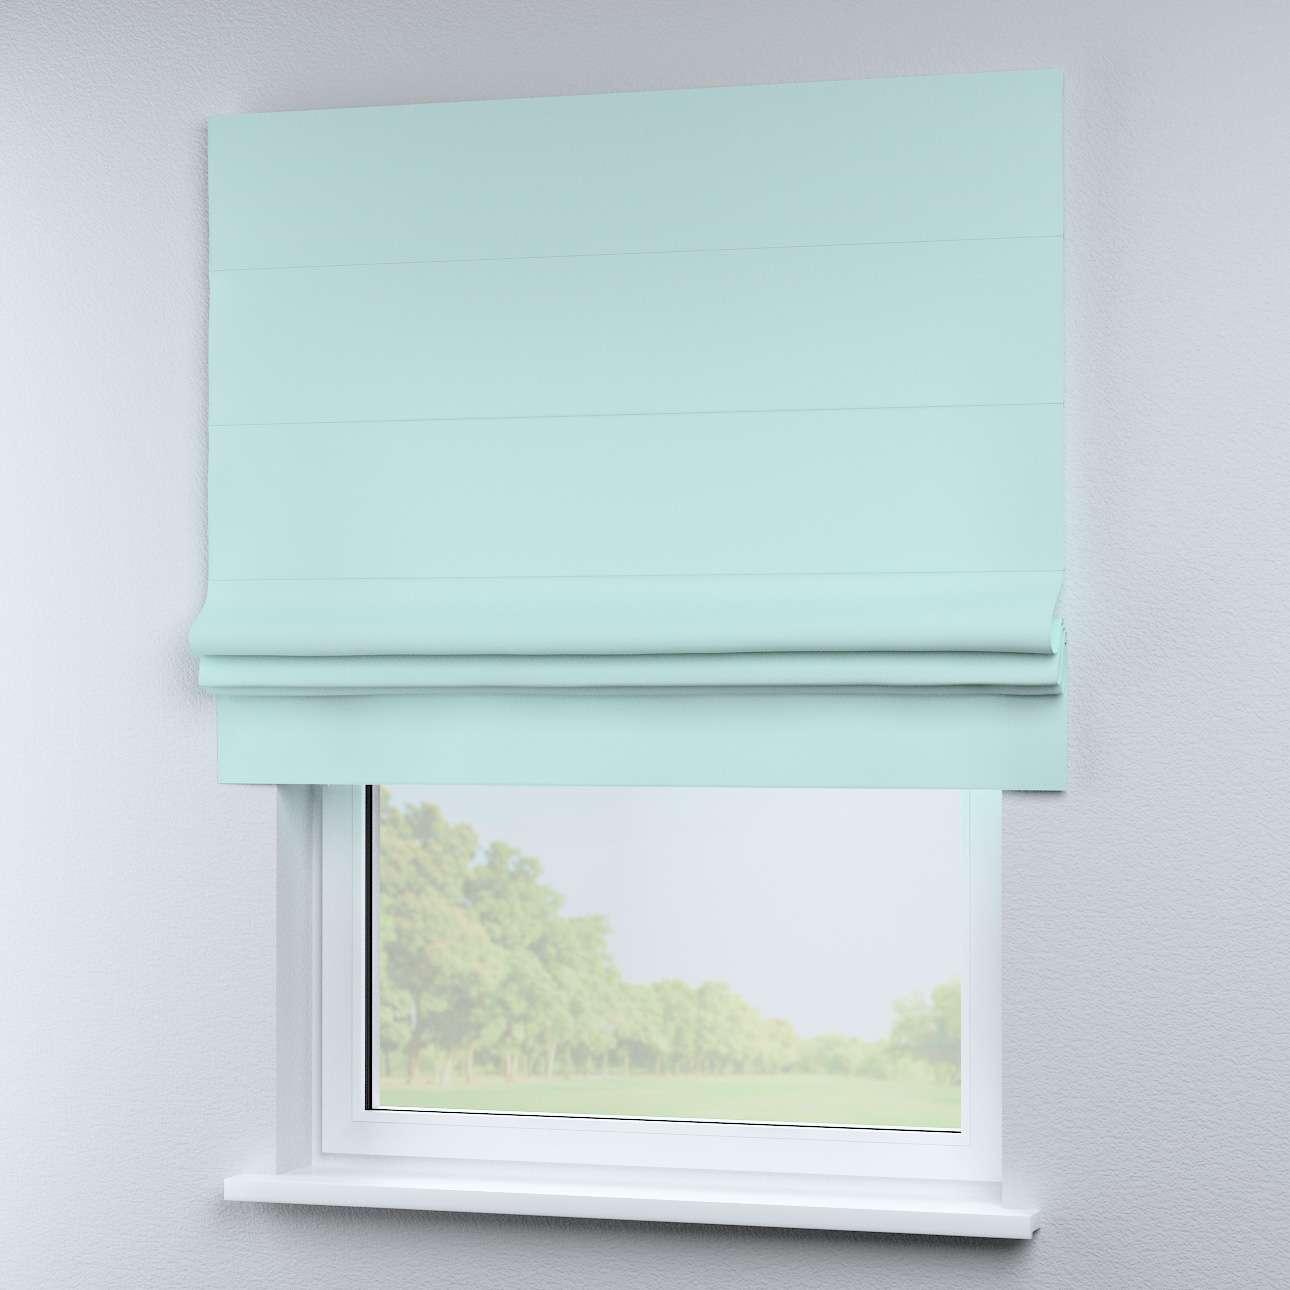 Foldegardin Paris<br/>Med lige flæse 80 × 170 cm fra kollektionen Cotton Panama, Stof: 702-10